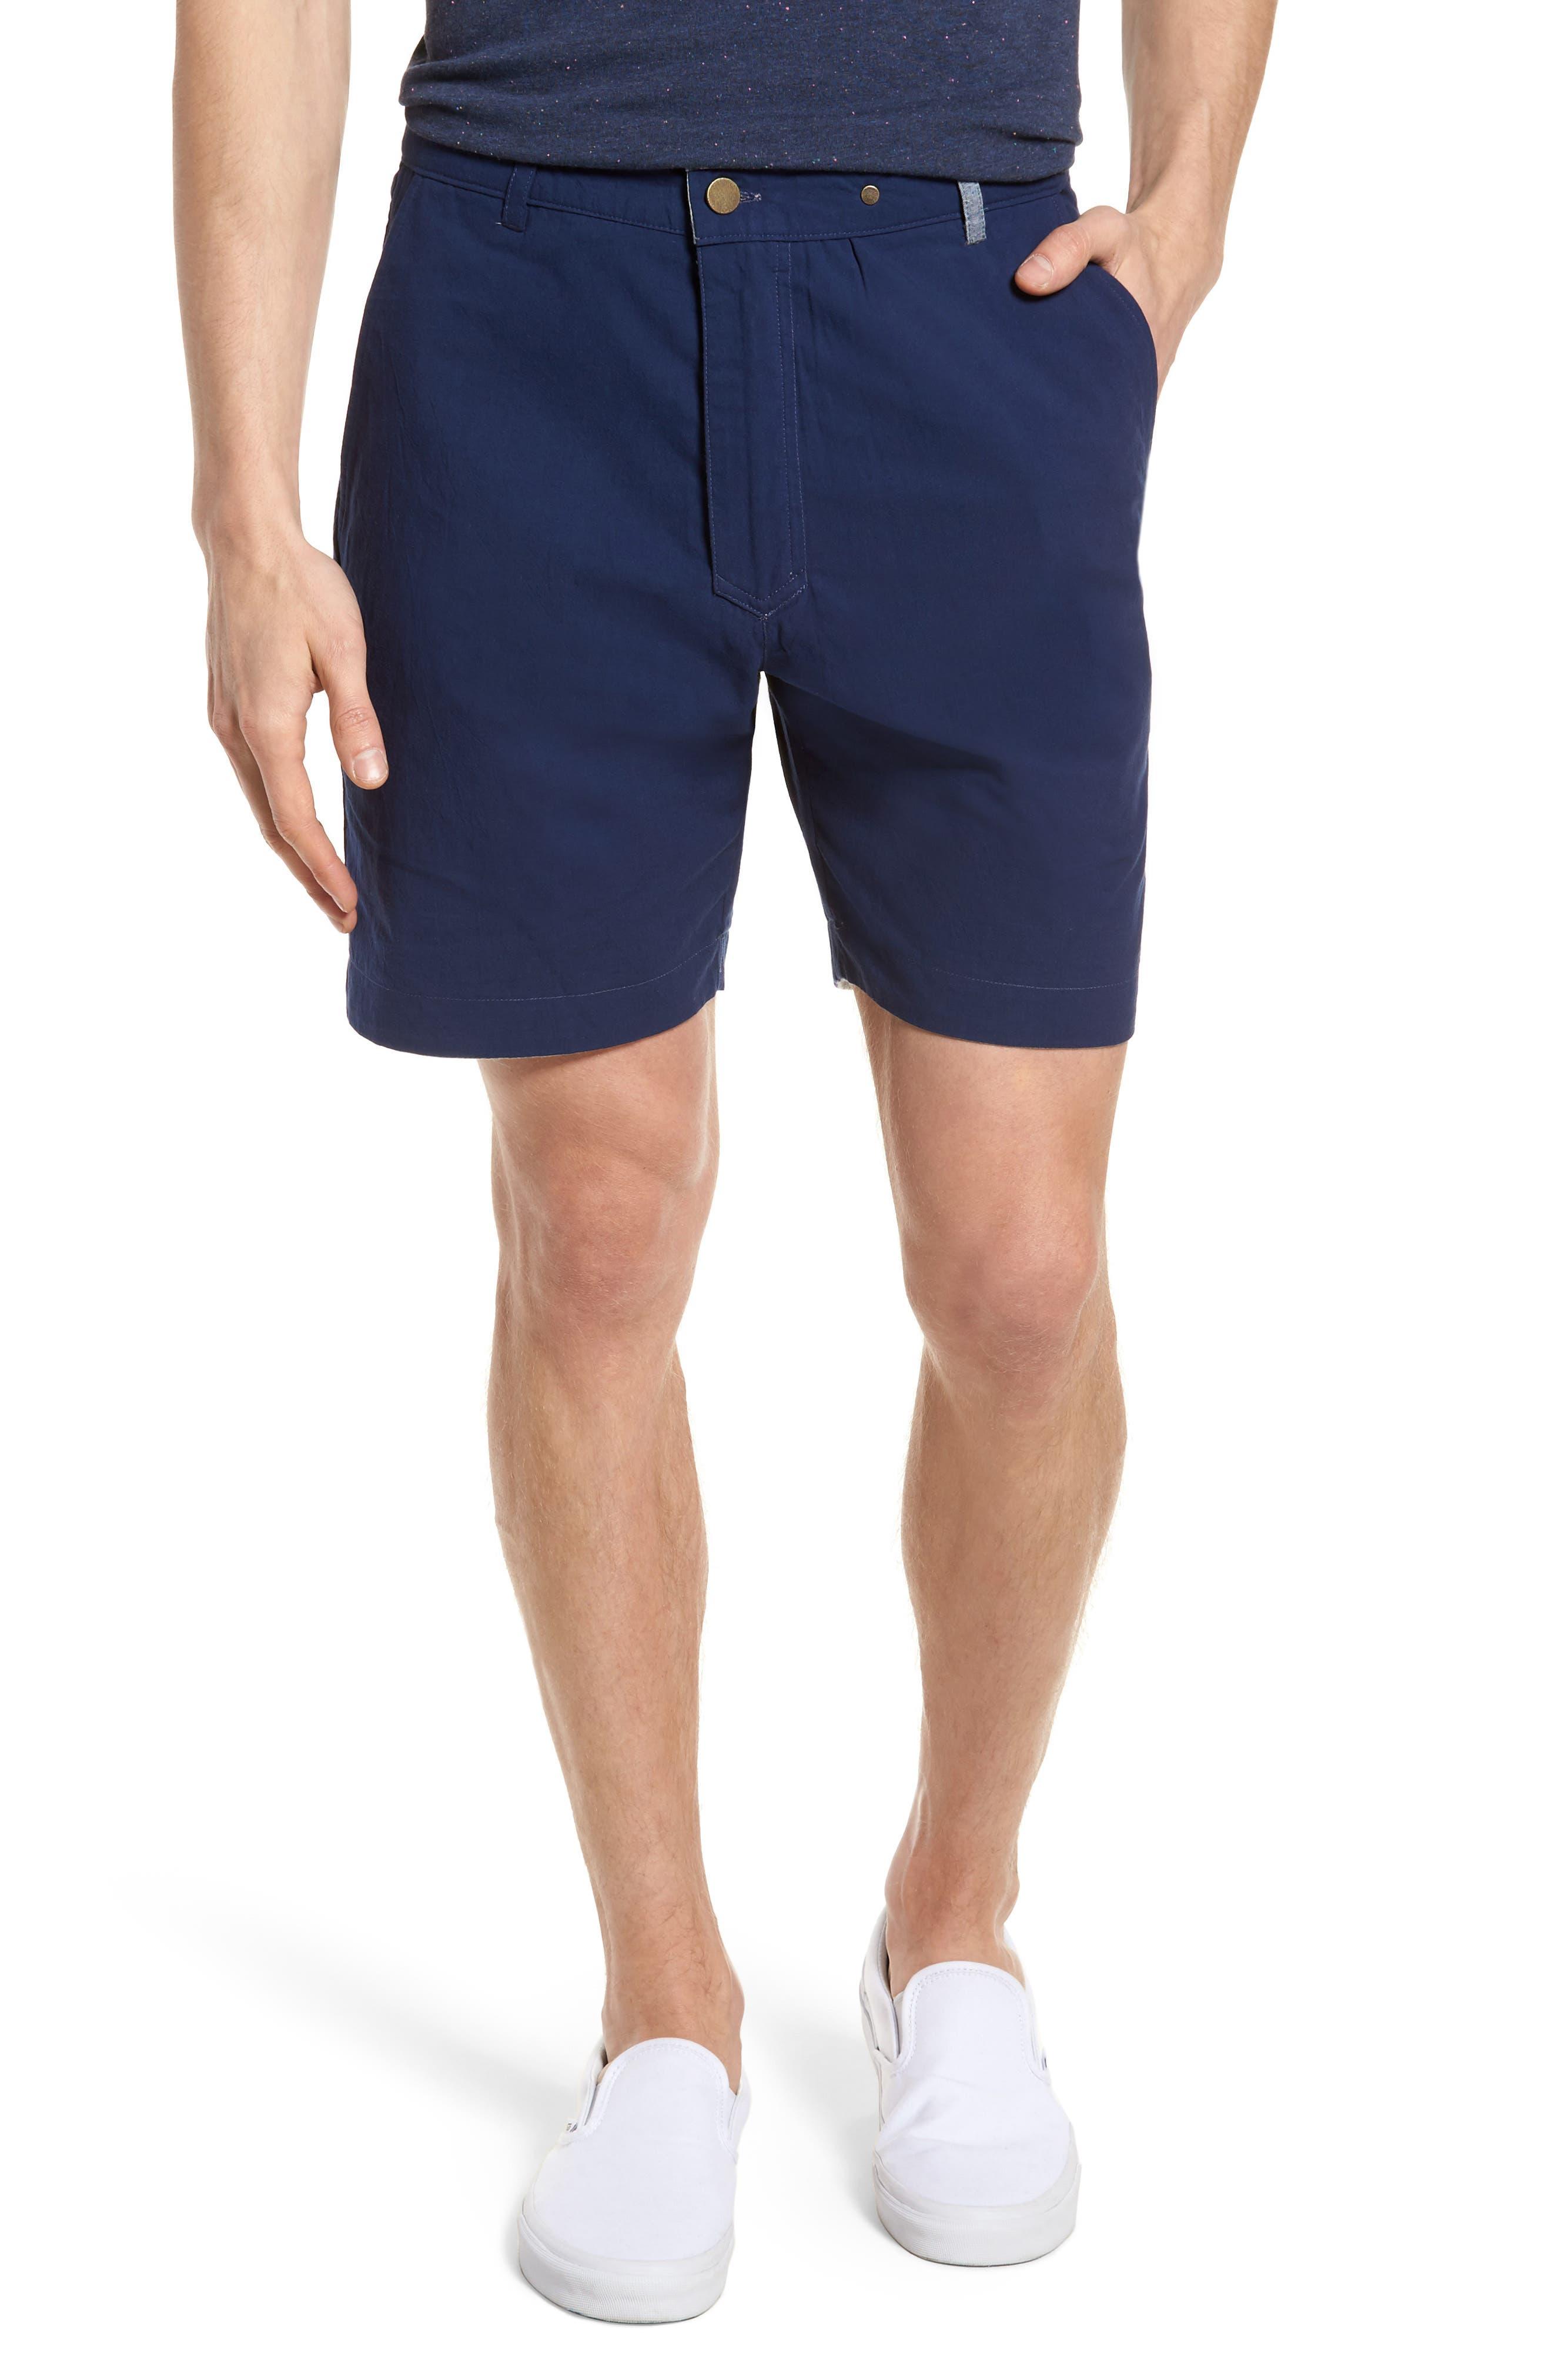 Rock Steady Reversible Shorts,                         Main,                         color, Grey